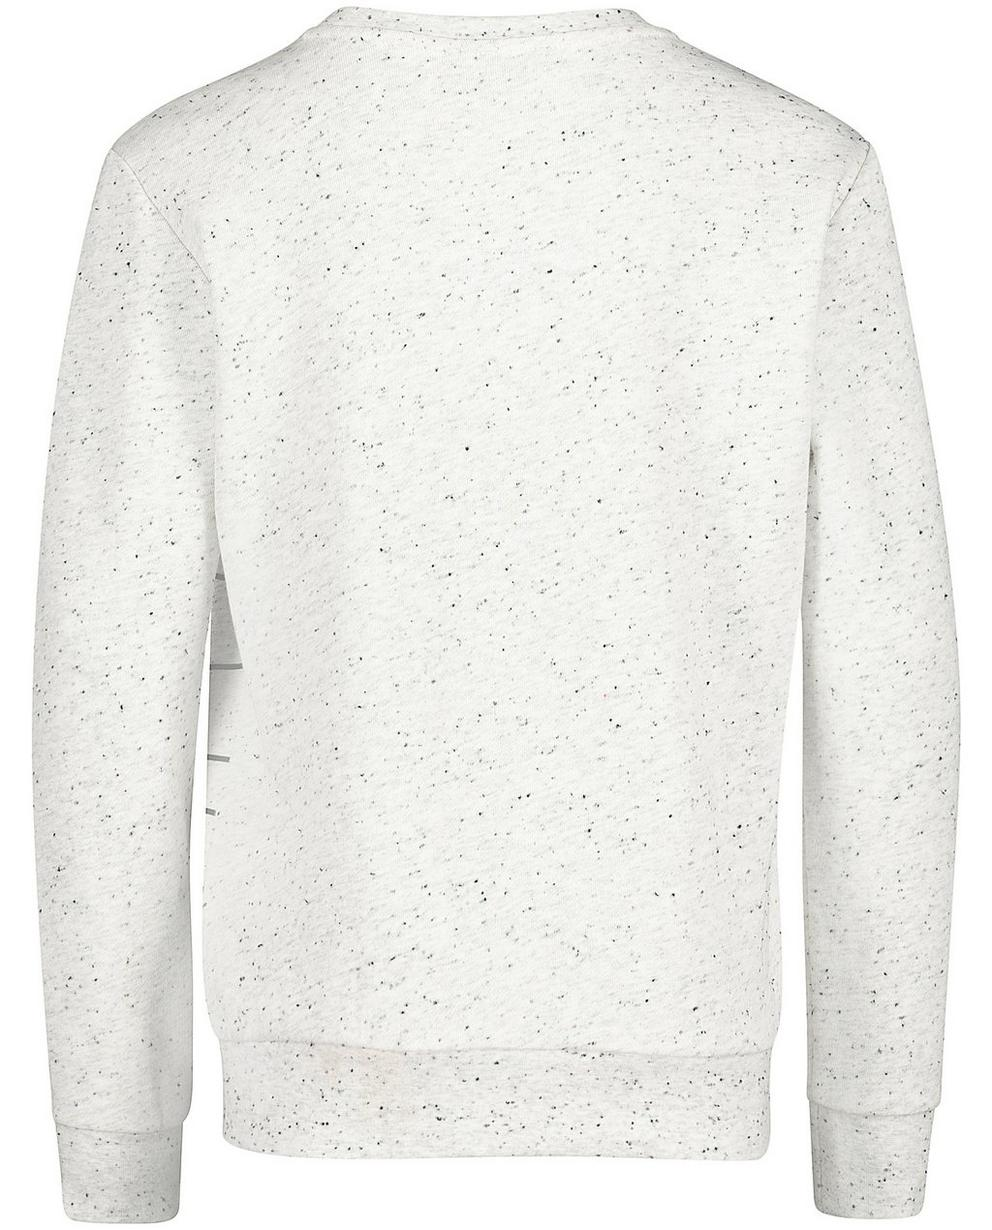 Sweater - Weiss -